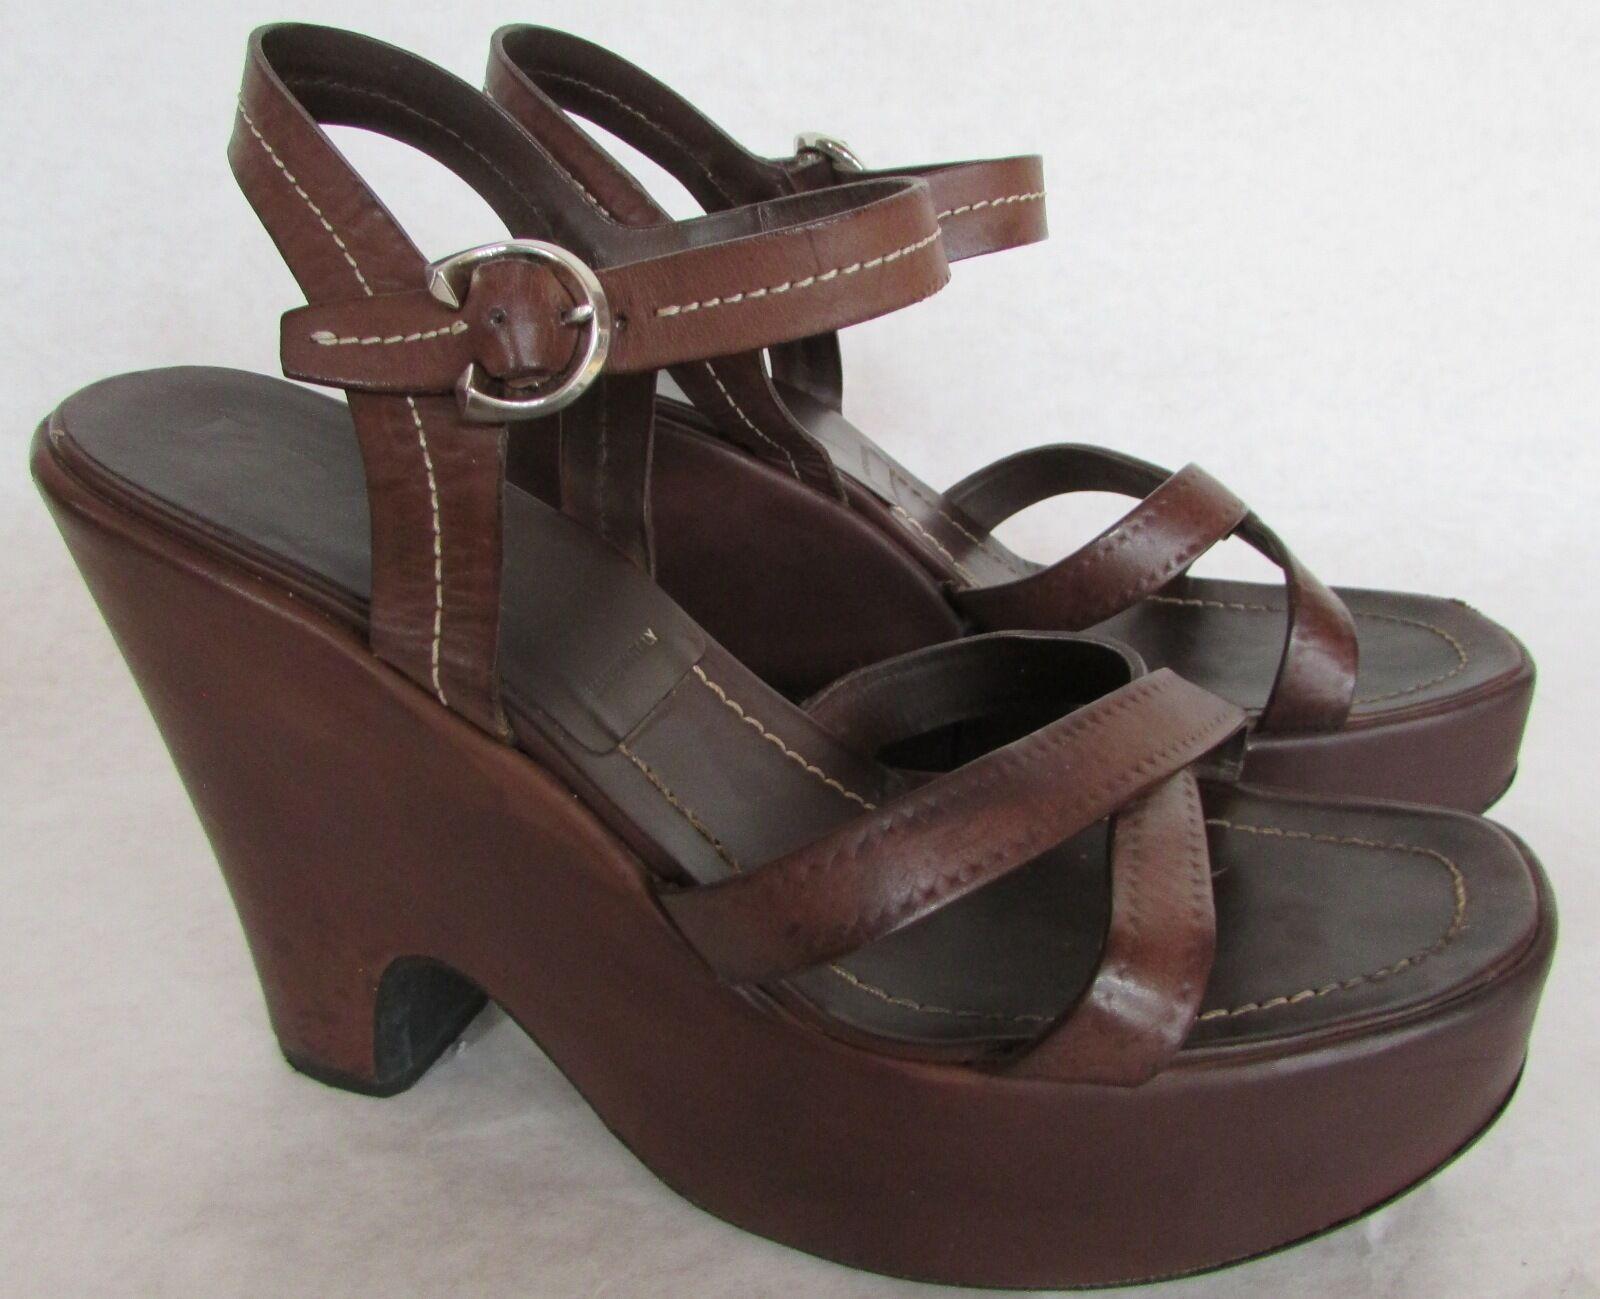 895.00 Prada Calzature damen braun Leather Platform Wedge Sandals 7.5